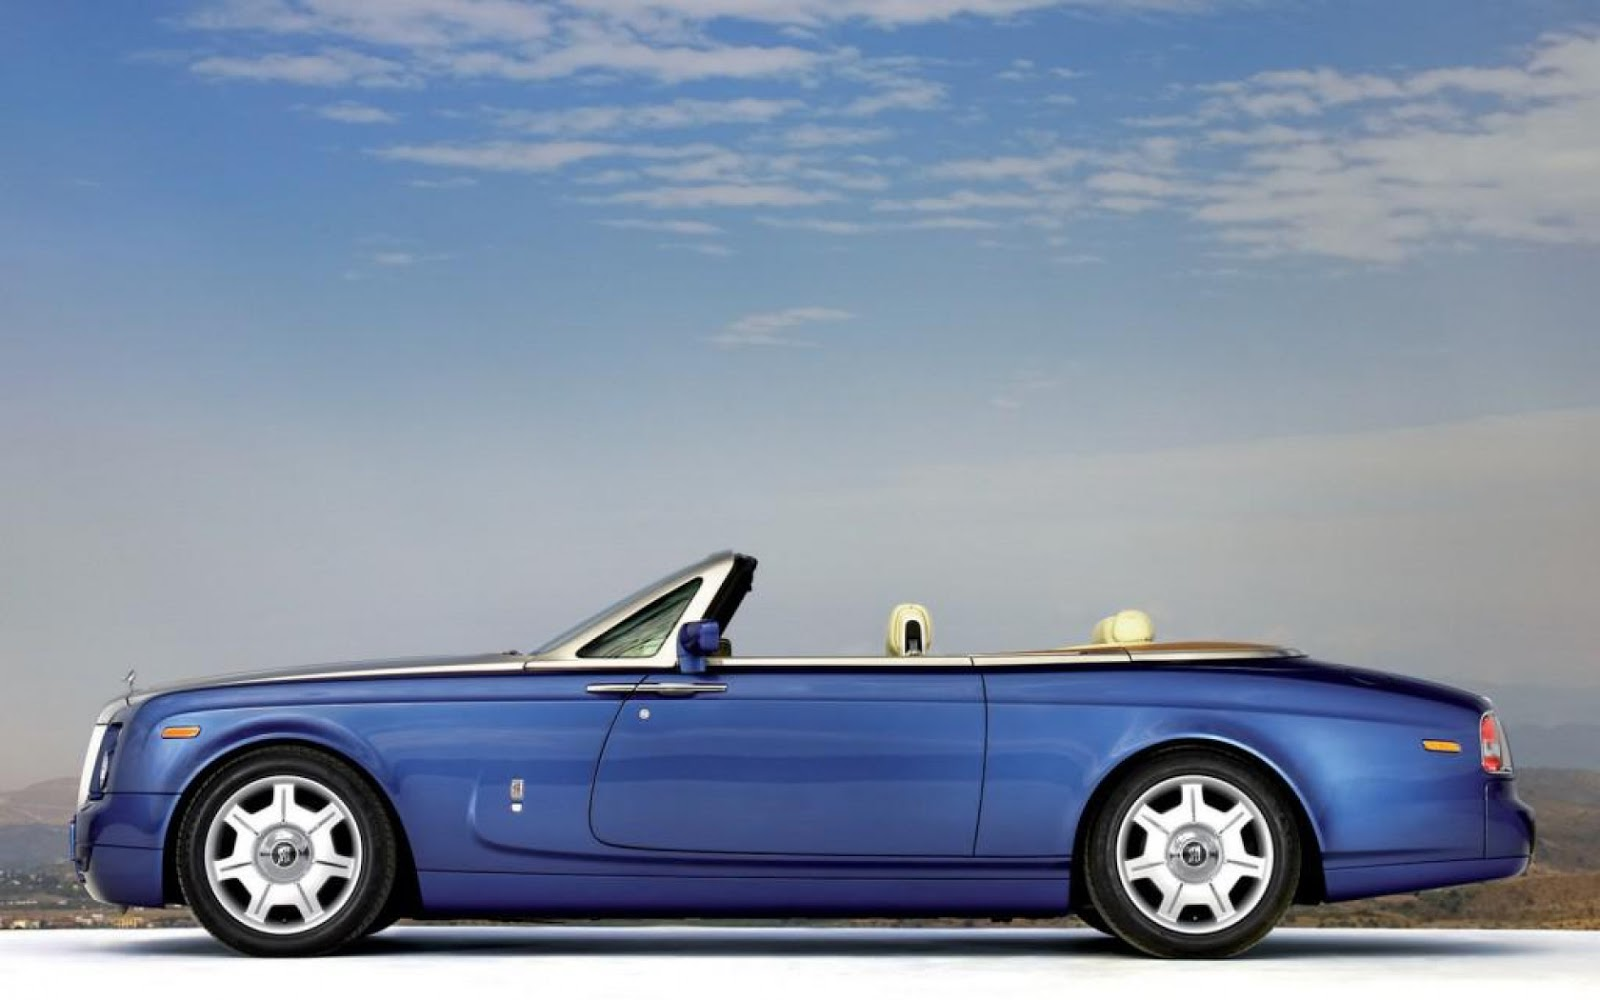 SPORTS CARS: Rolls Royce phantom drophead coupe wallpaper